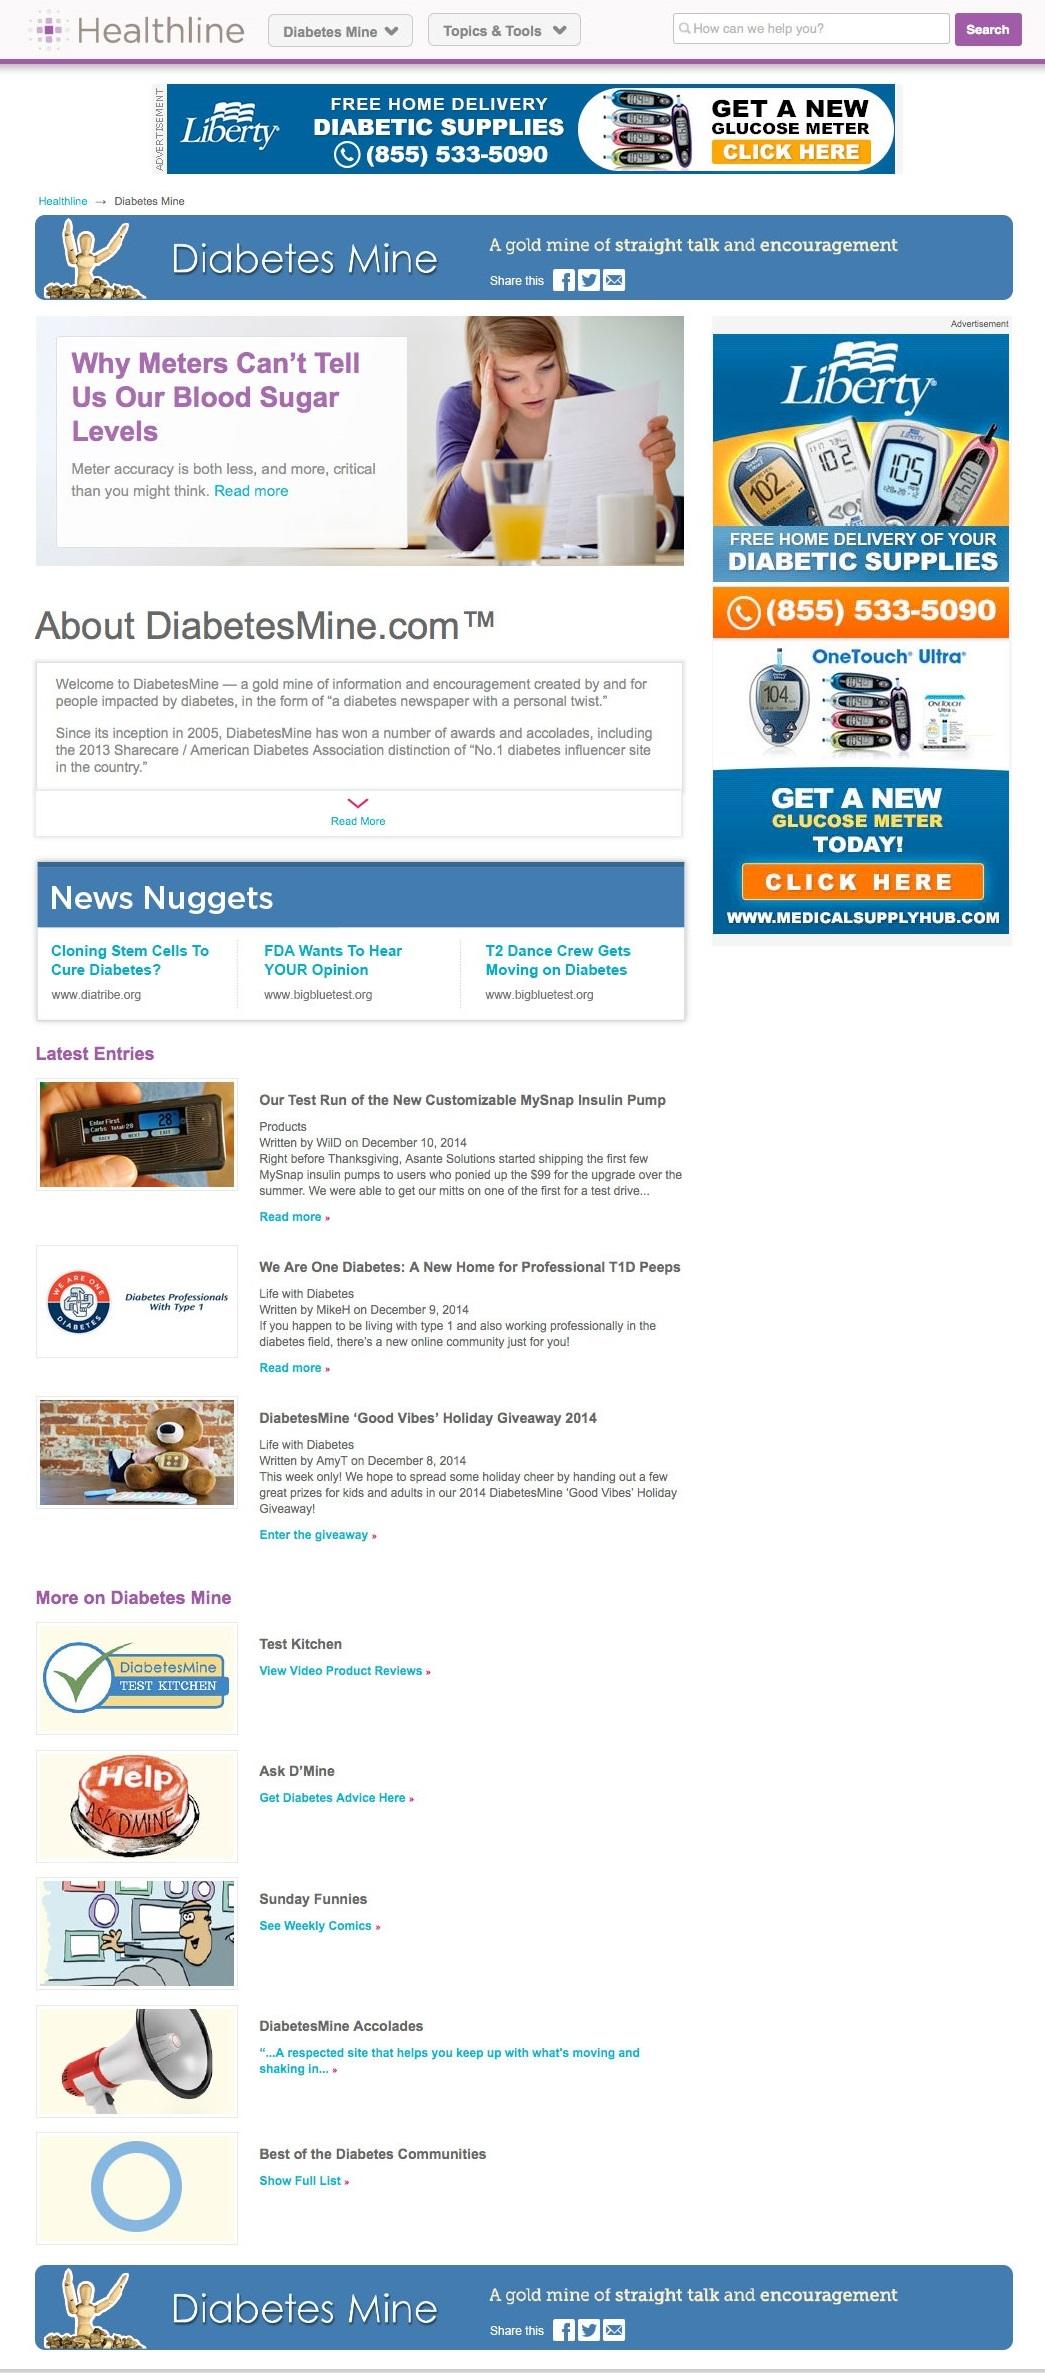 interm-homepage-Healthline-DBMine